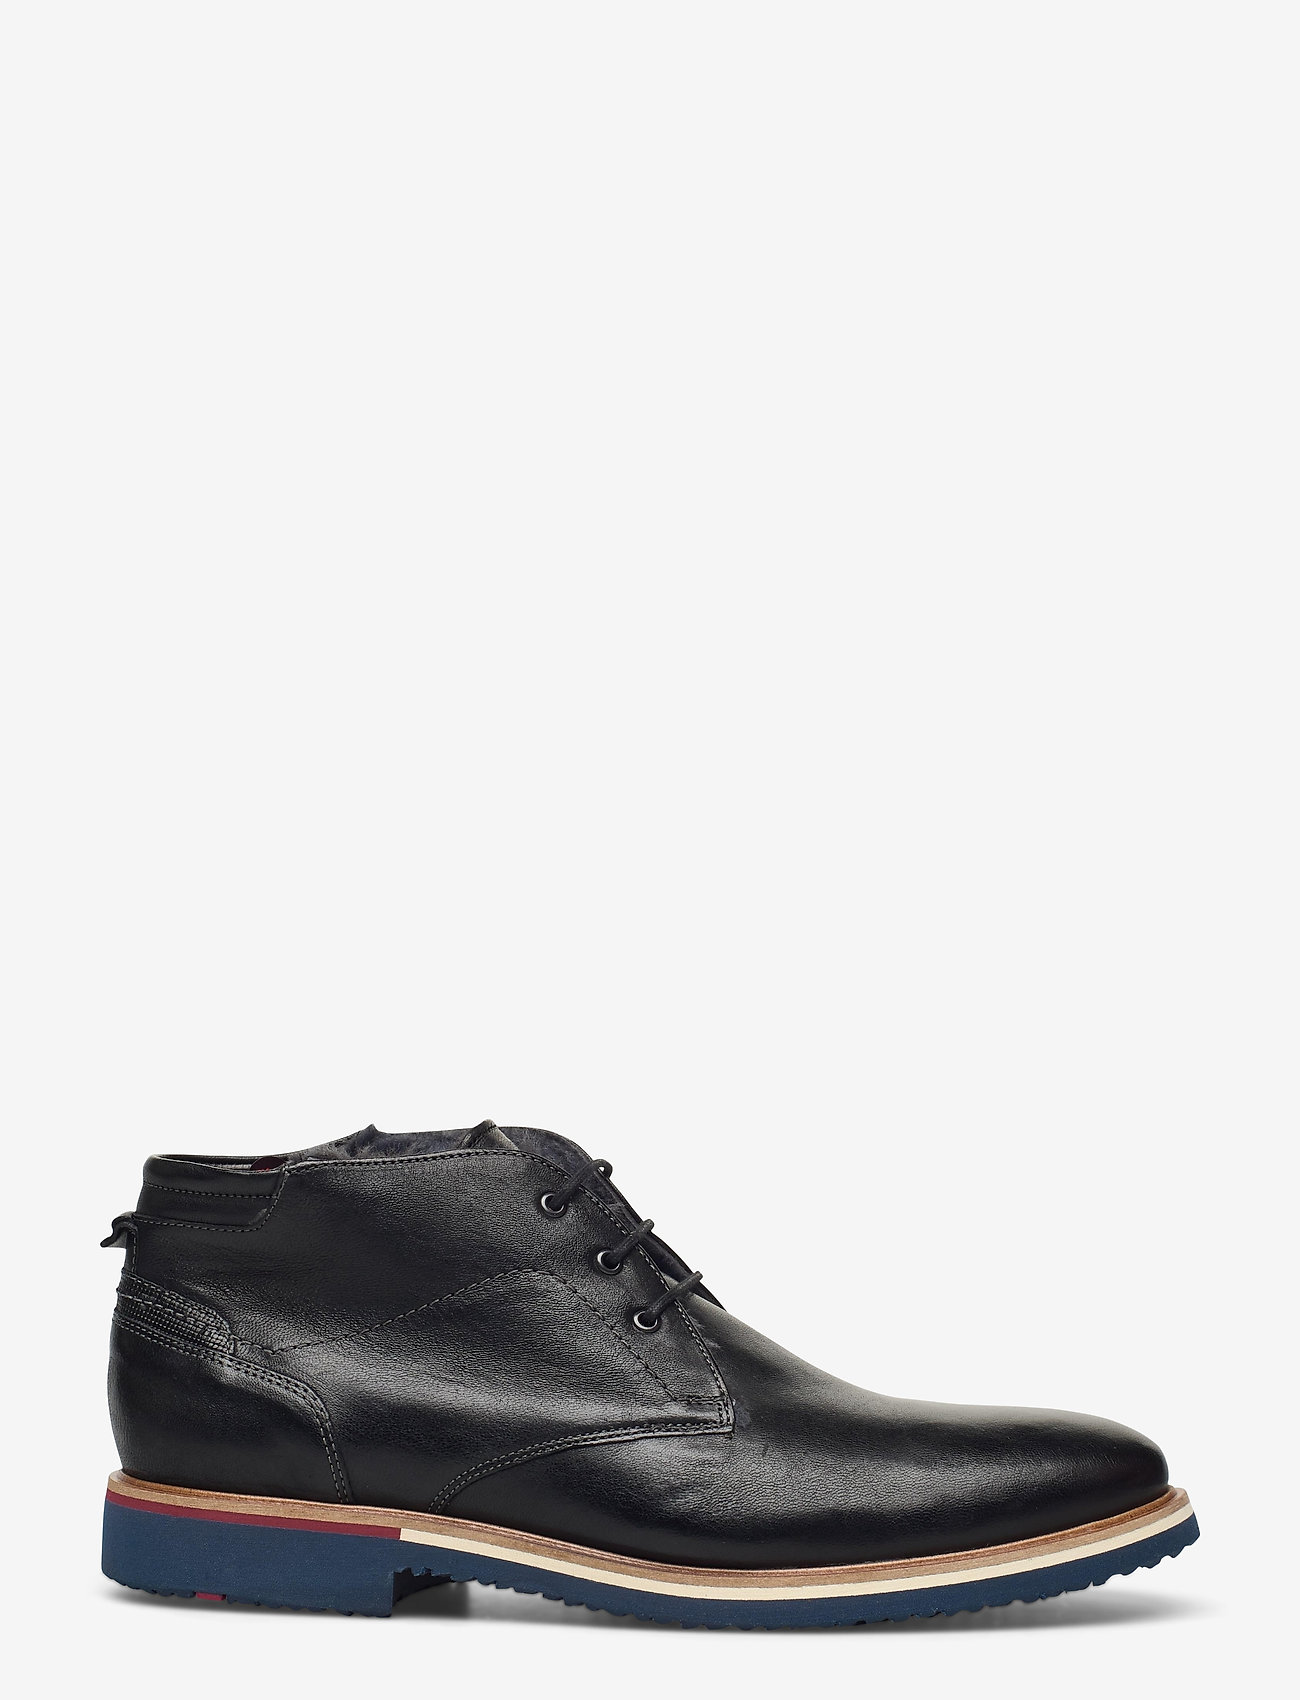 Lloyd - FARIN - desert boots - 0 - schwarz - 1